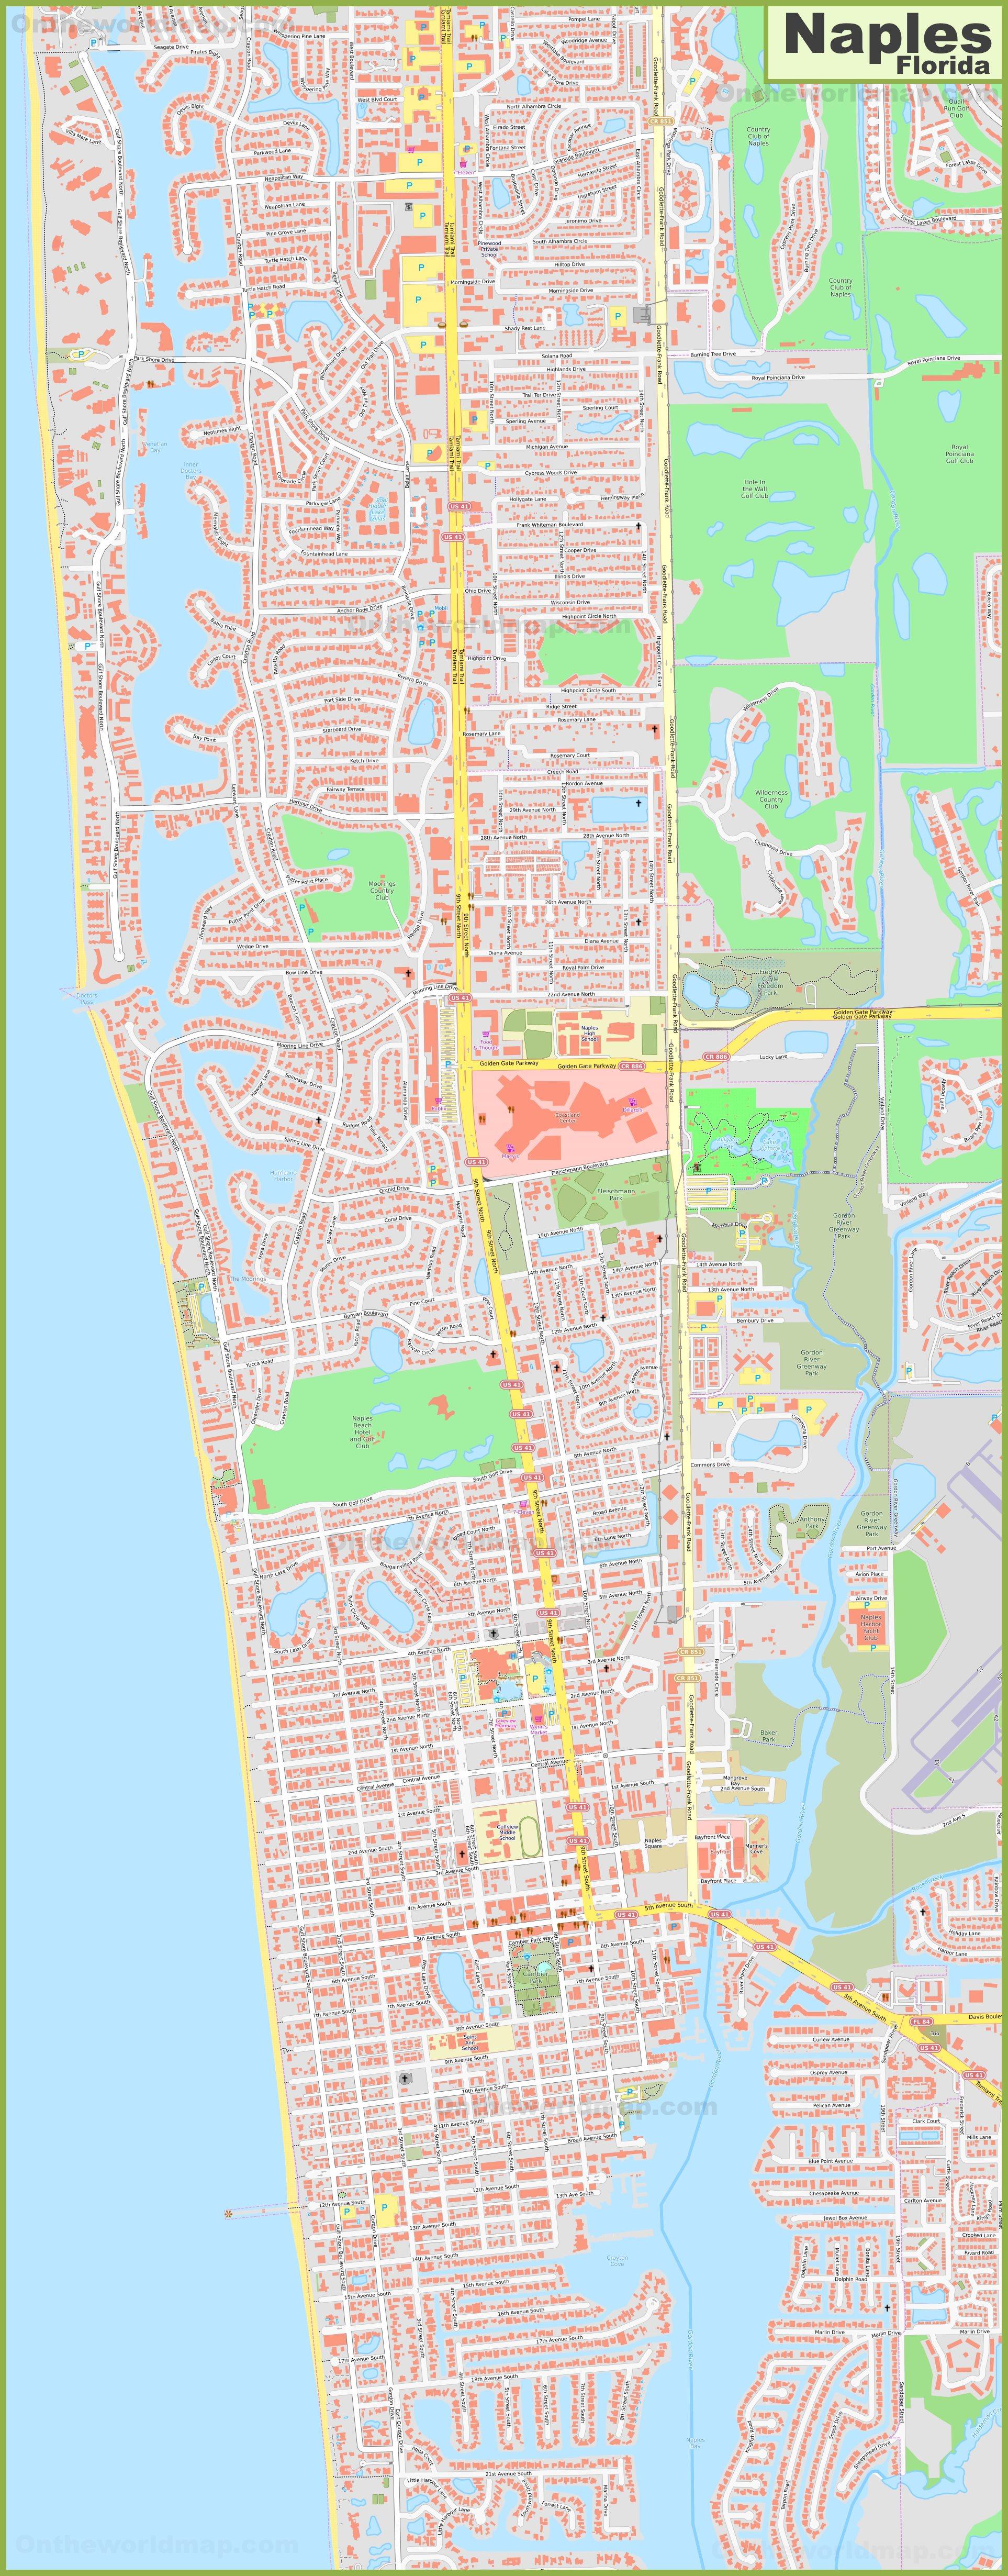 Naples Florida Map.Large Detailed Map Of Naples Florida